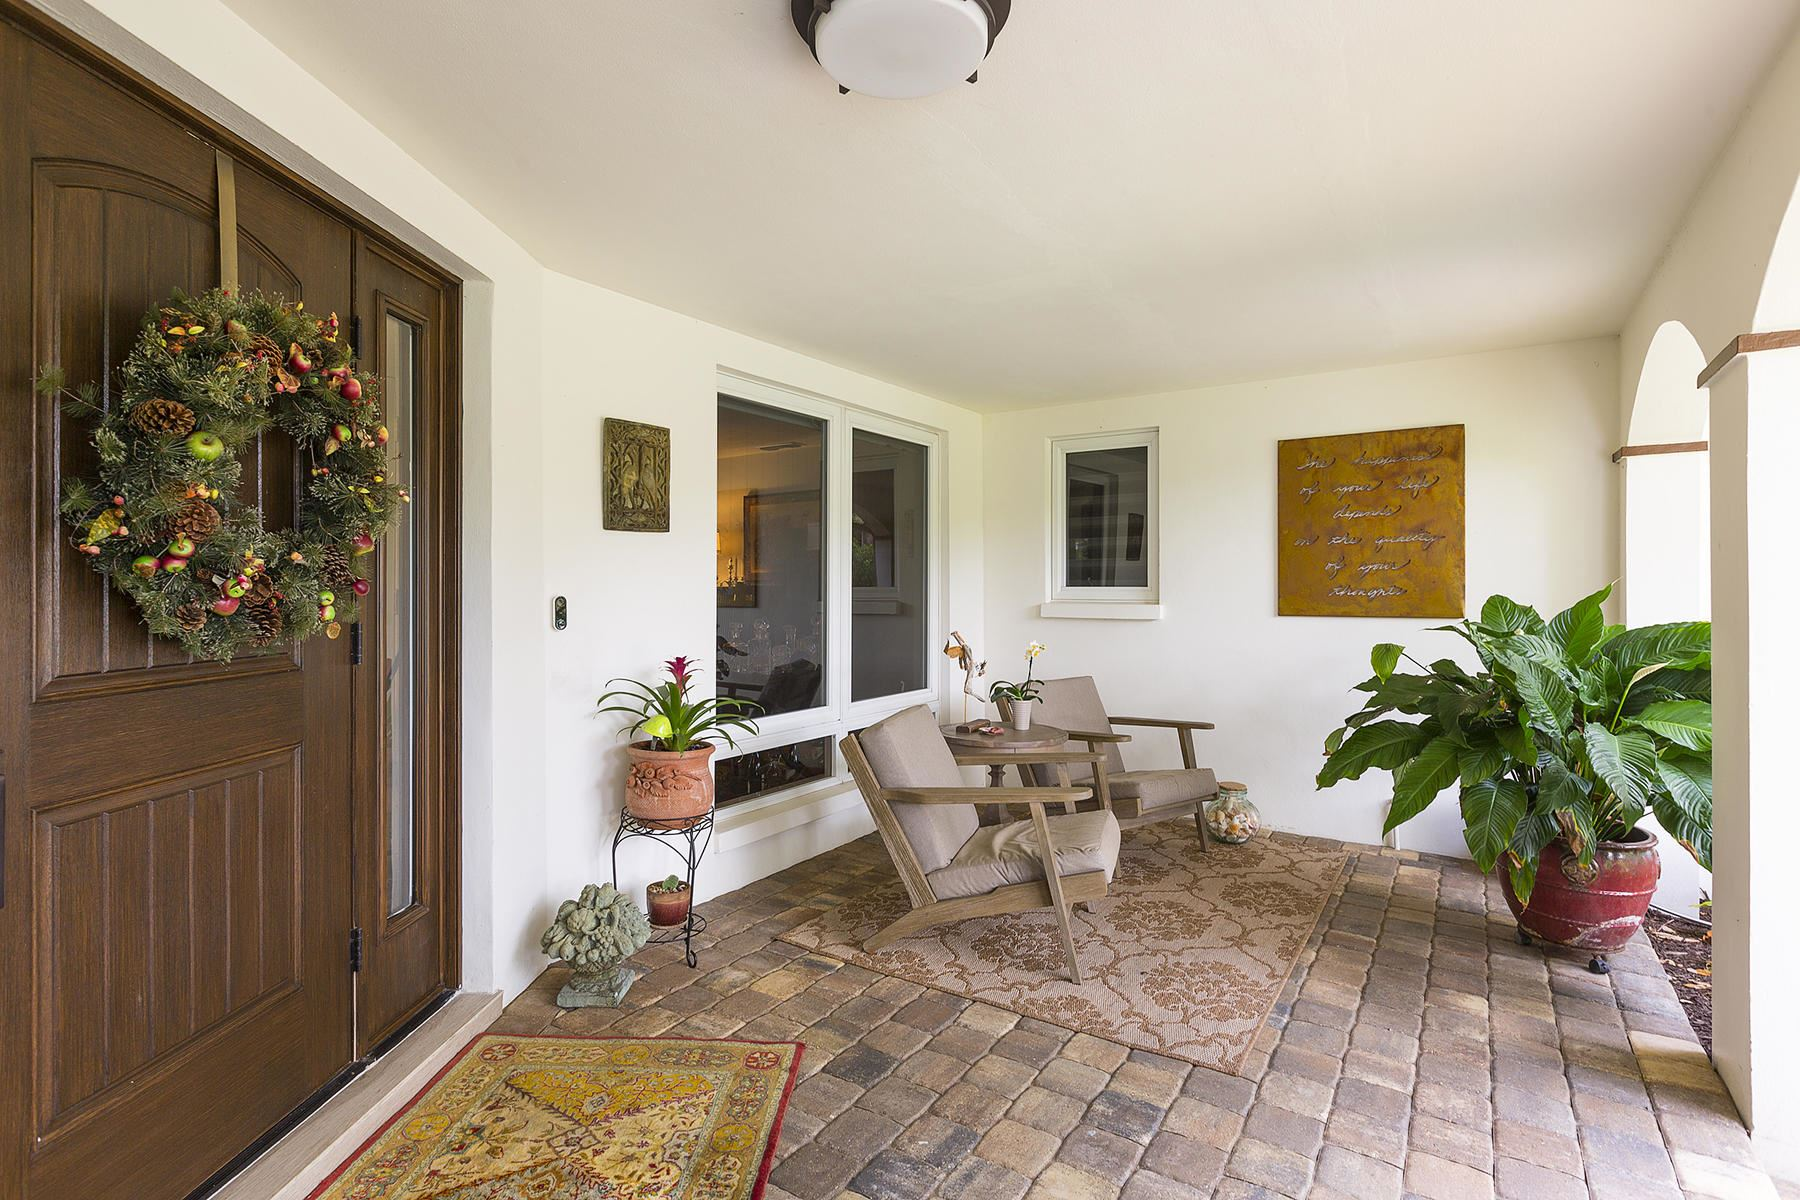 Photo of 624 Gardenia Terrace, Delray Beach, FL 33444 (MLS # RX-10695089)